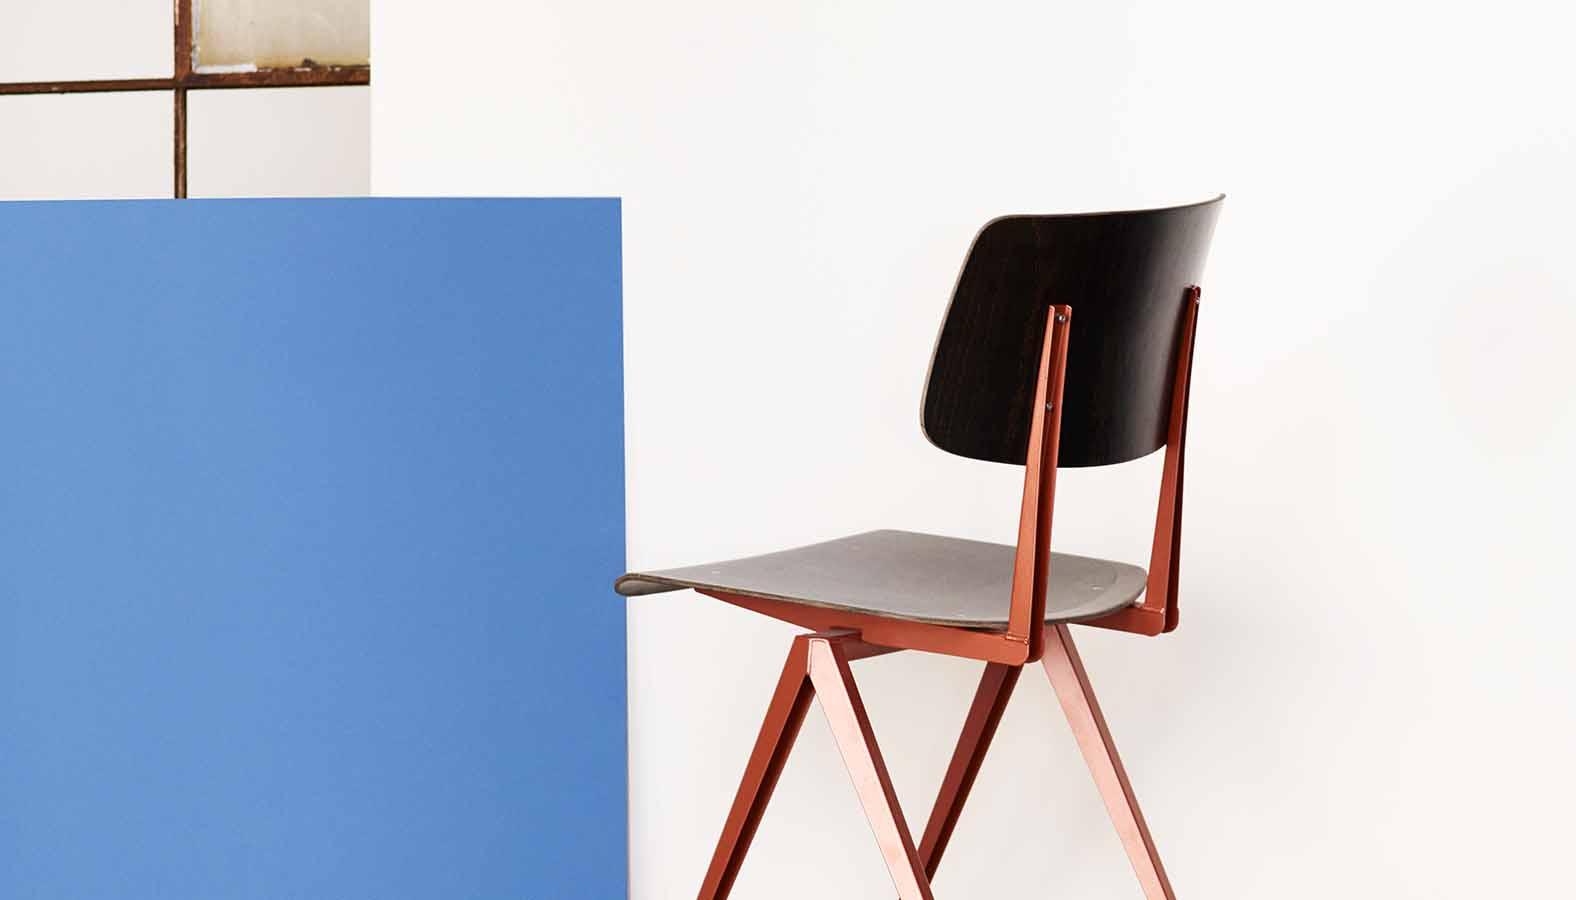 skandinavische mode chic aus dem hohen norden zalando. Black Bedroom Furniture Sets. Home Design Ideas